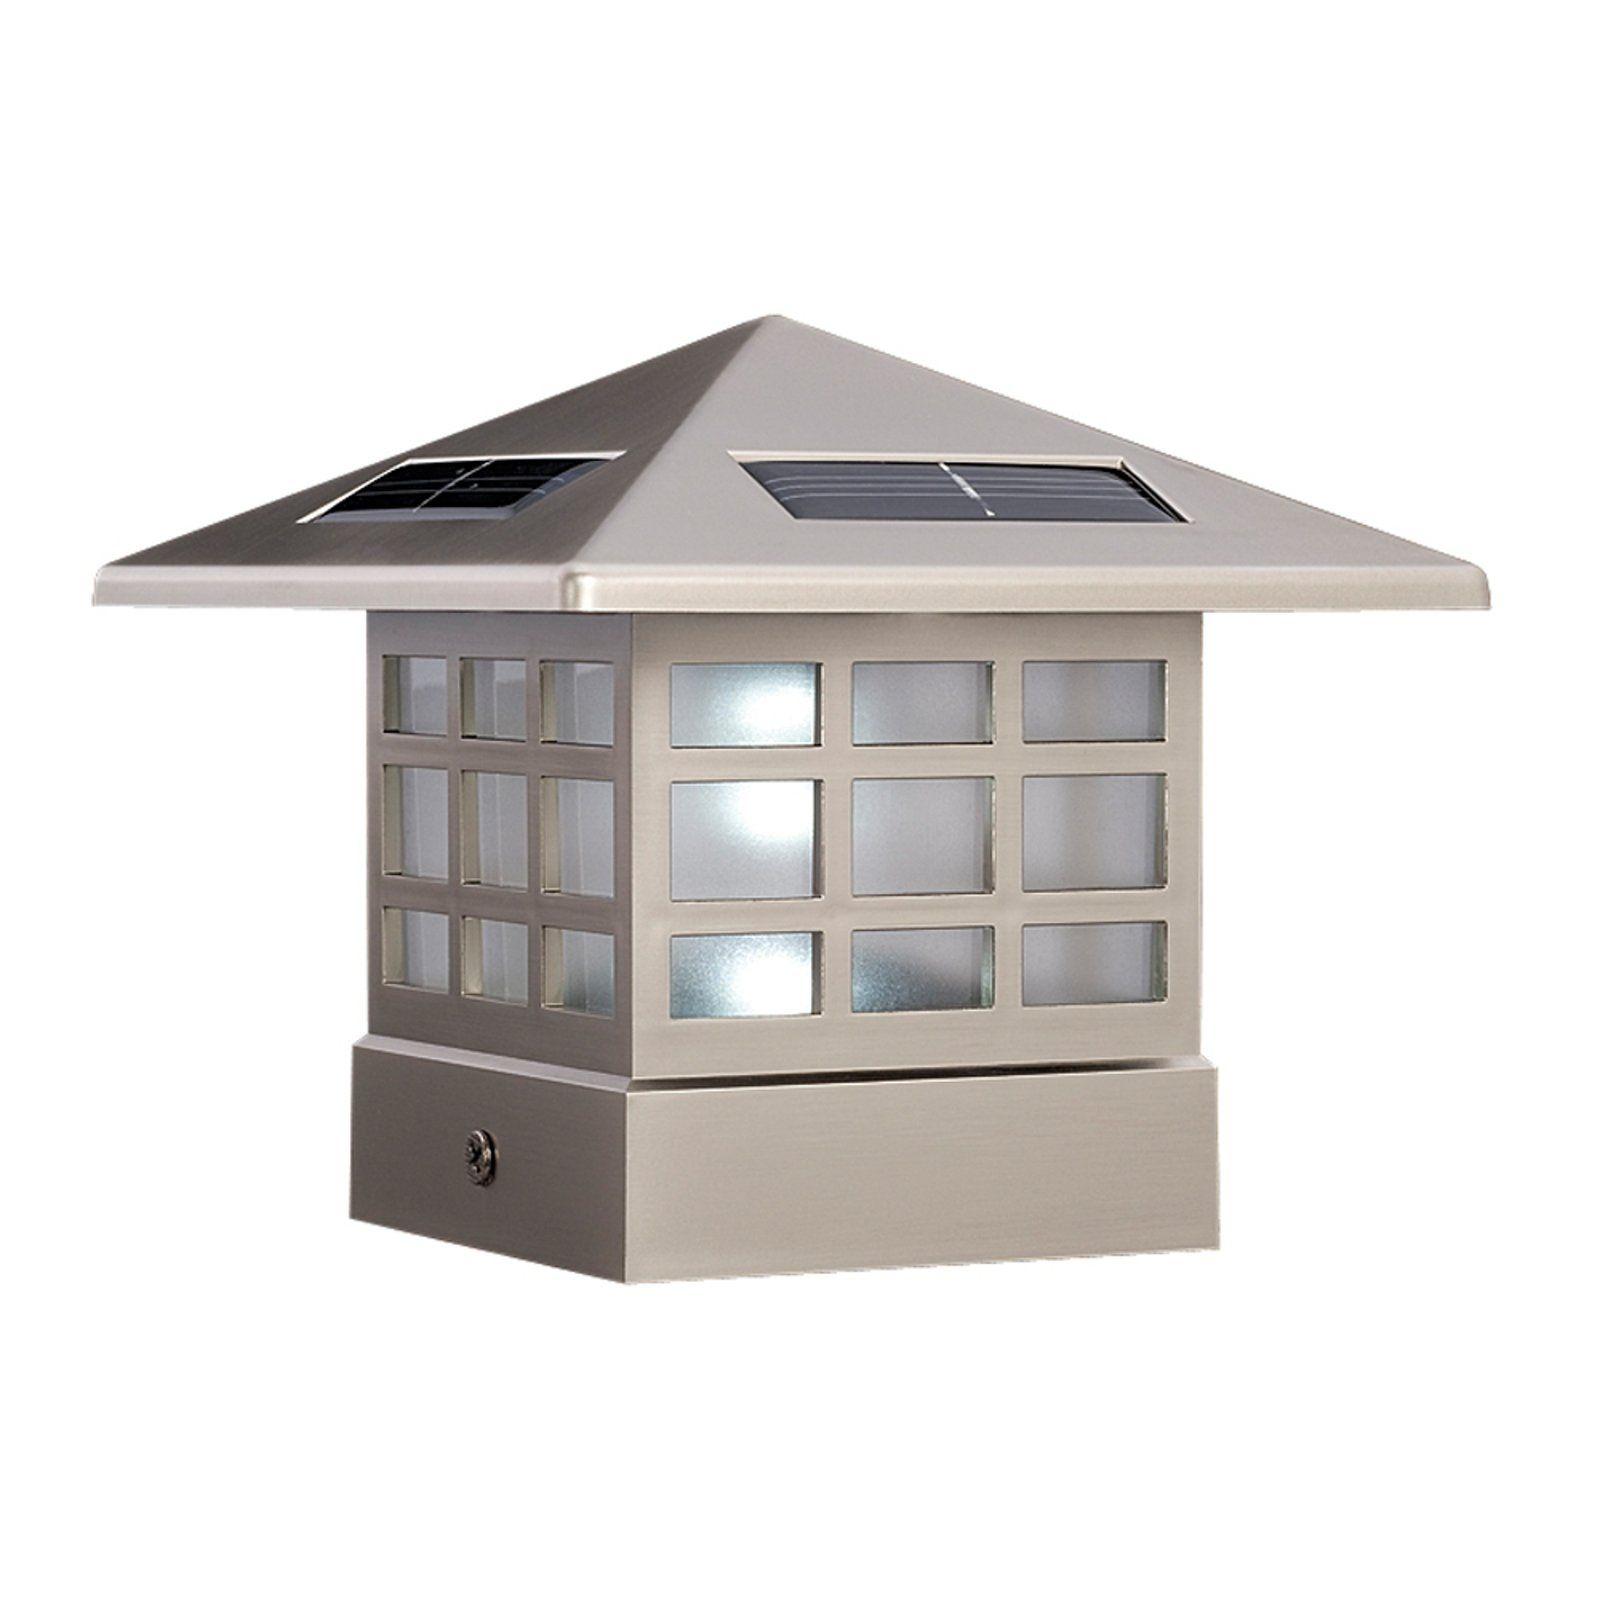 Inspirational solar Porch Post Lights